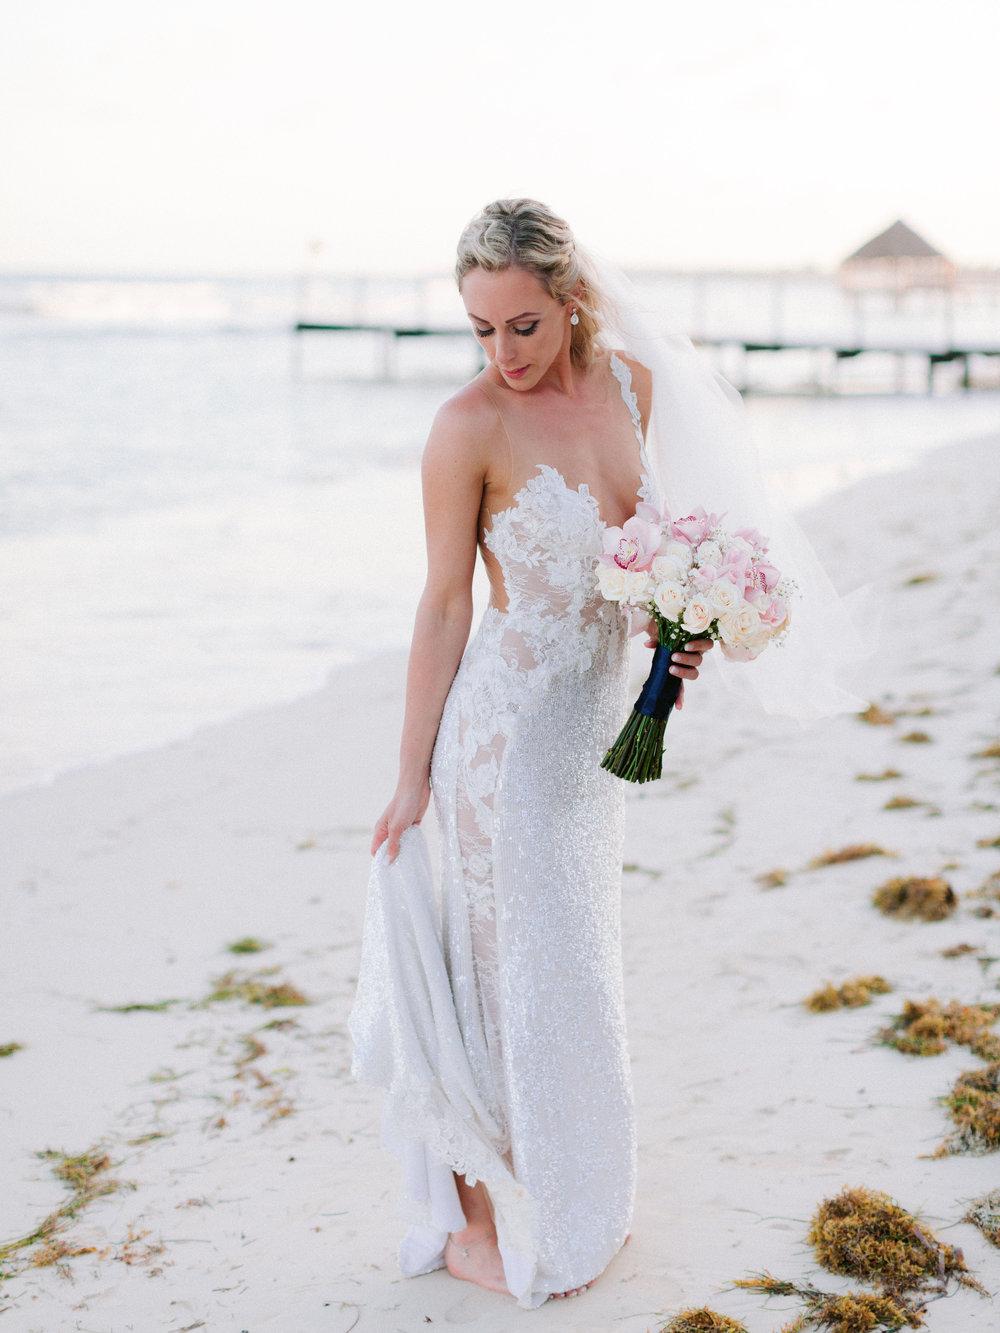 Kim_Jeff_Cancun Wedding_Portraits_Kurtz_Orpia (125 of 178).jpg